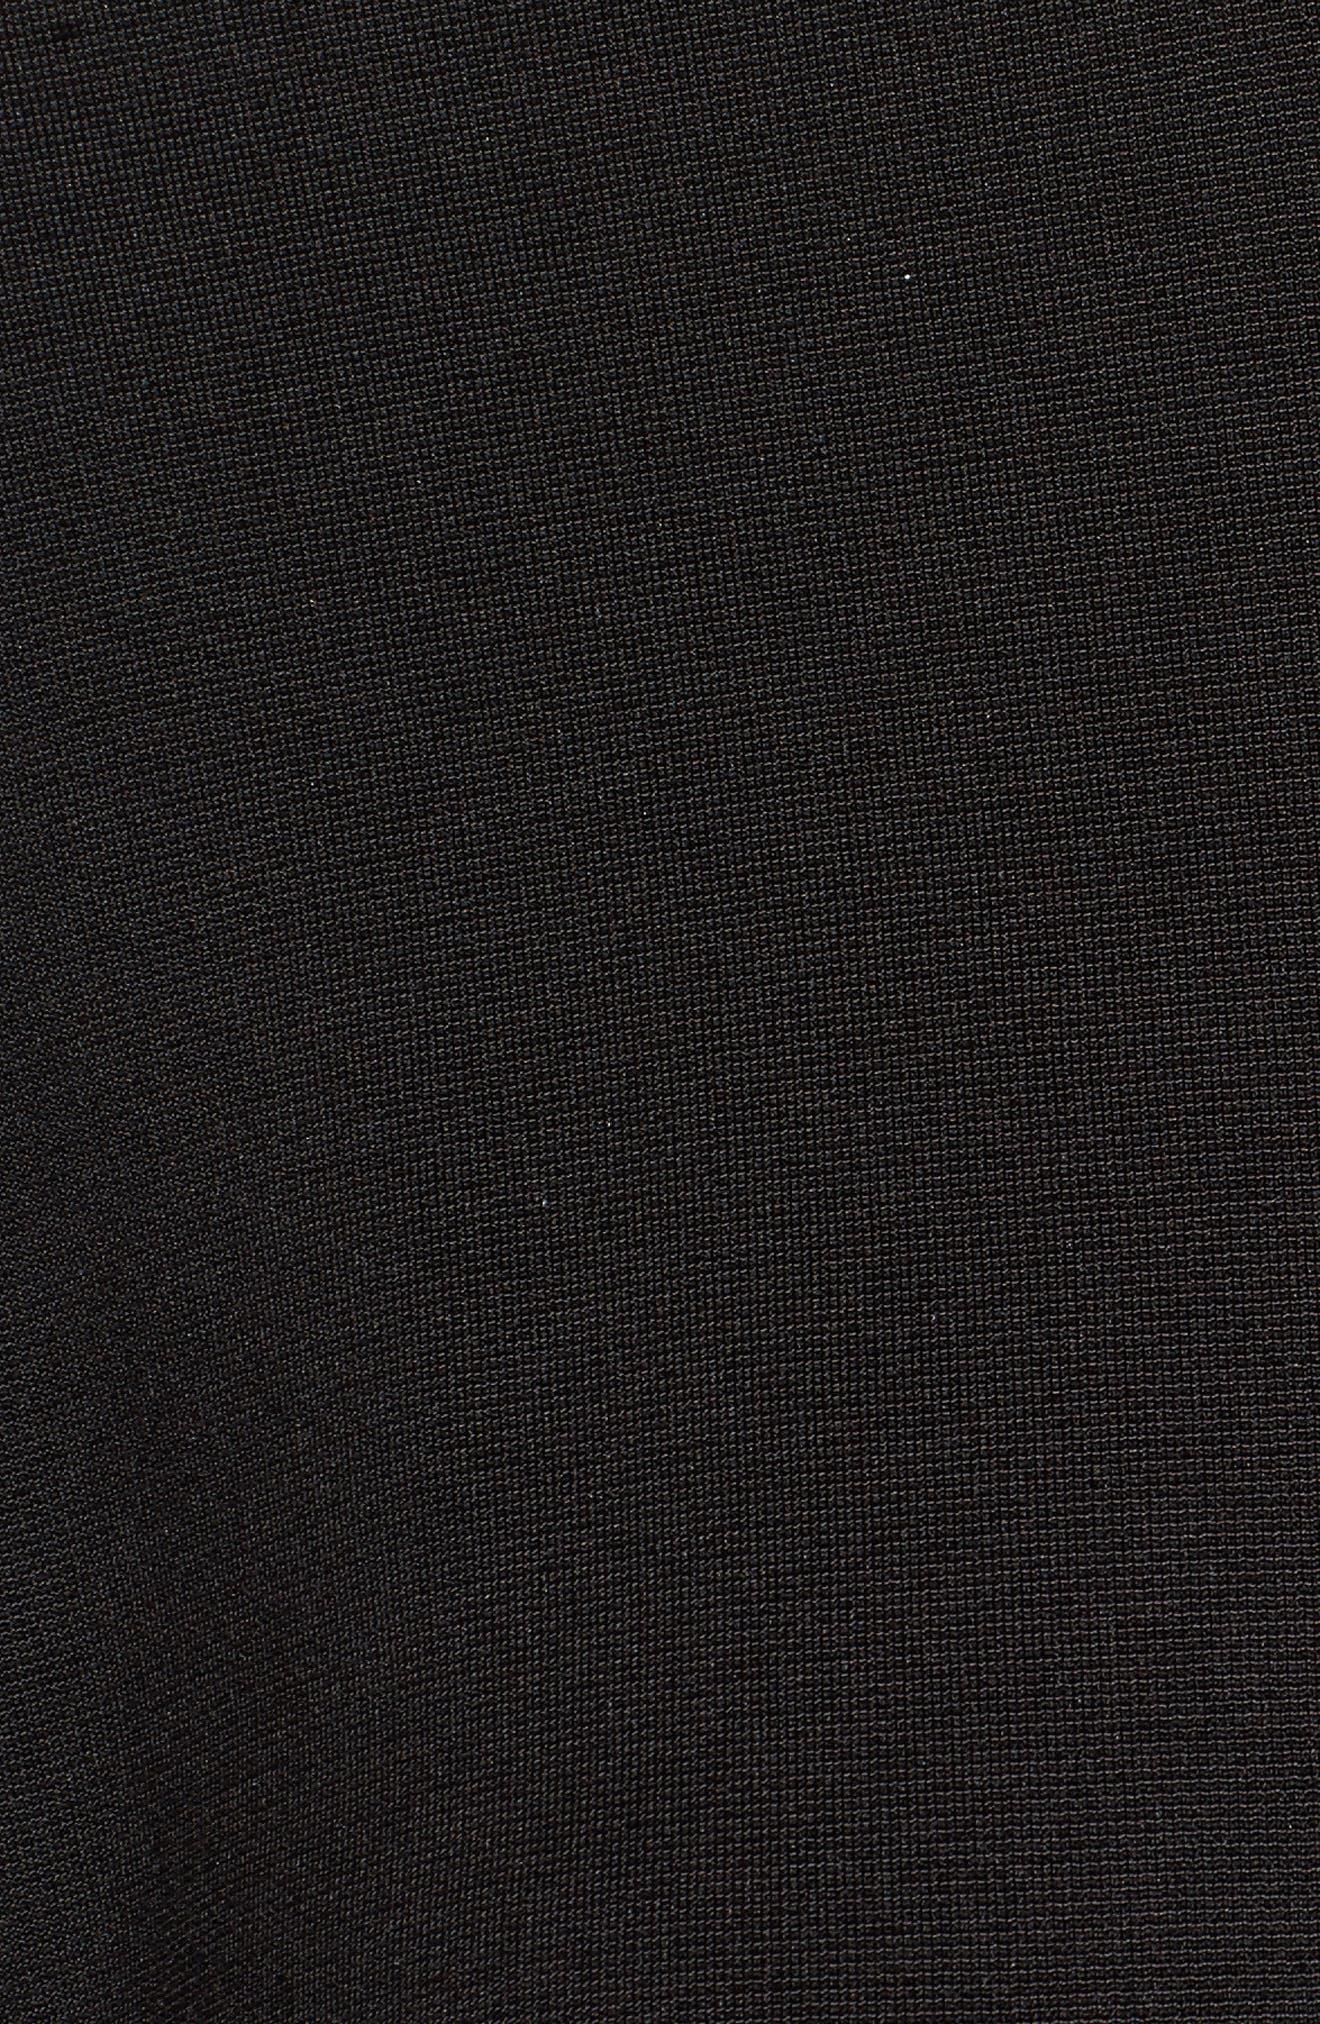 Mila Lace-Up Top,                             Alternate thumbnail 5, color,                             001